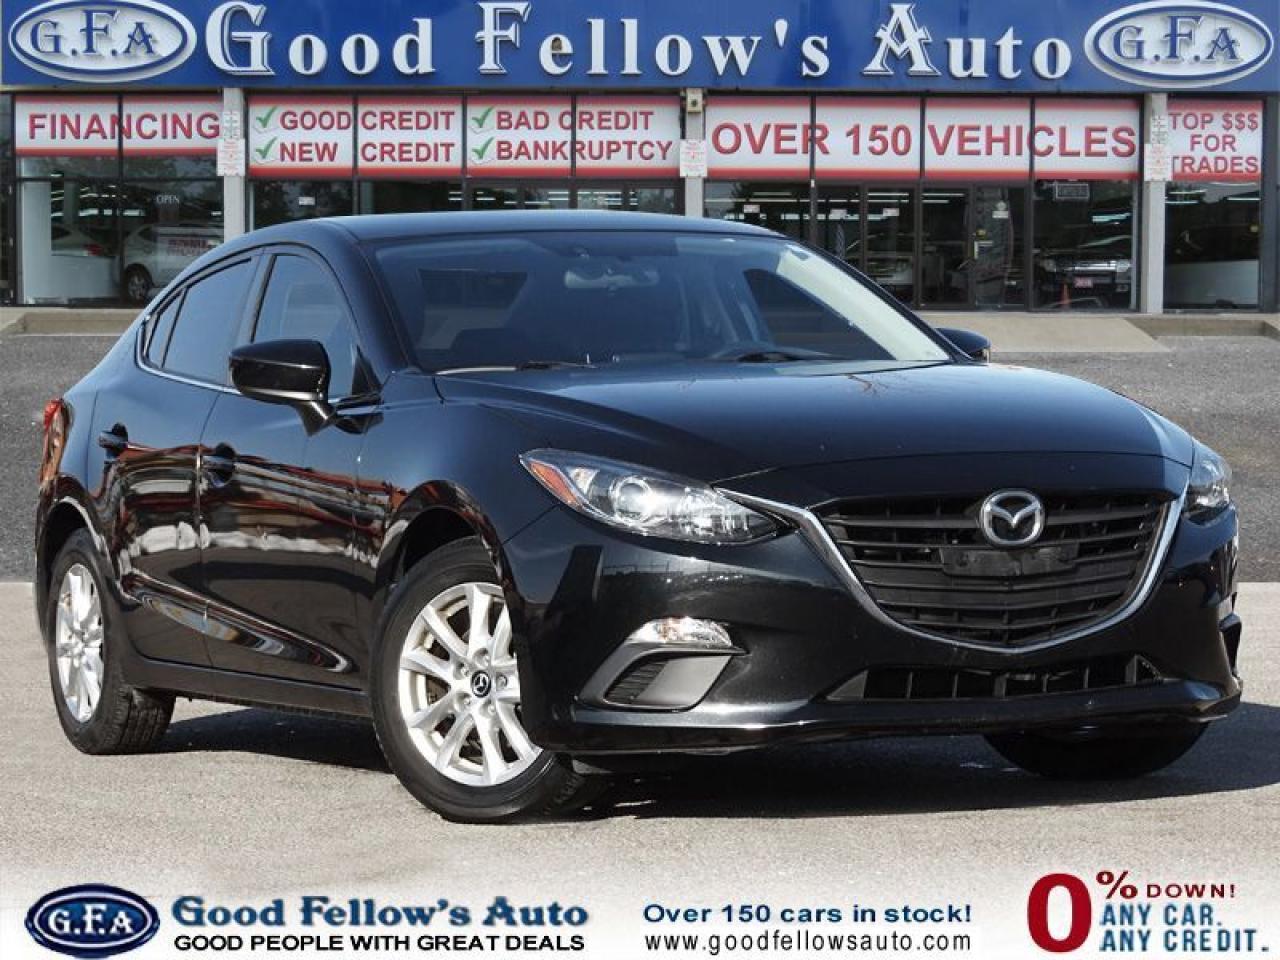 2015 Mazda MAZDA3 GS MODEL, SKYACTIV, REARVIEW CAMERA, HEATED SEATS